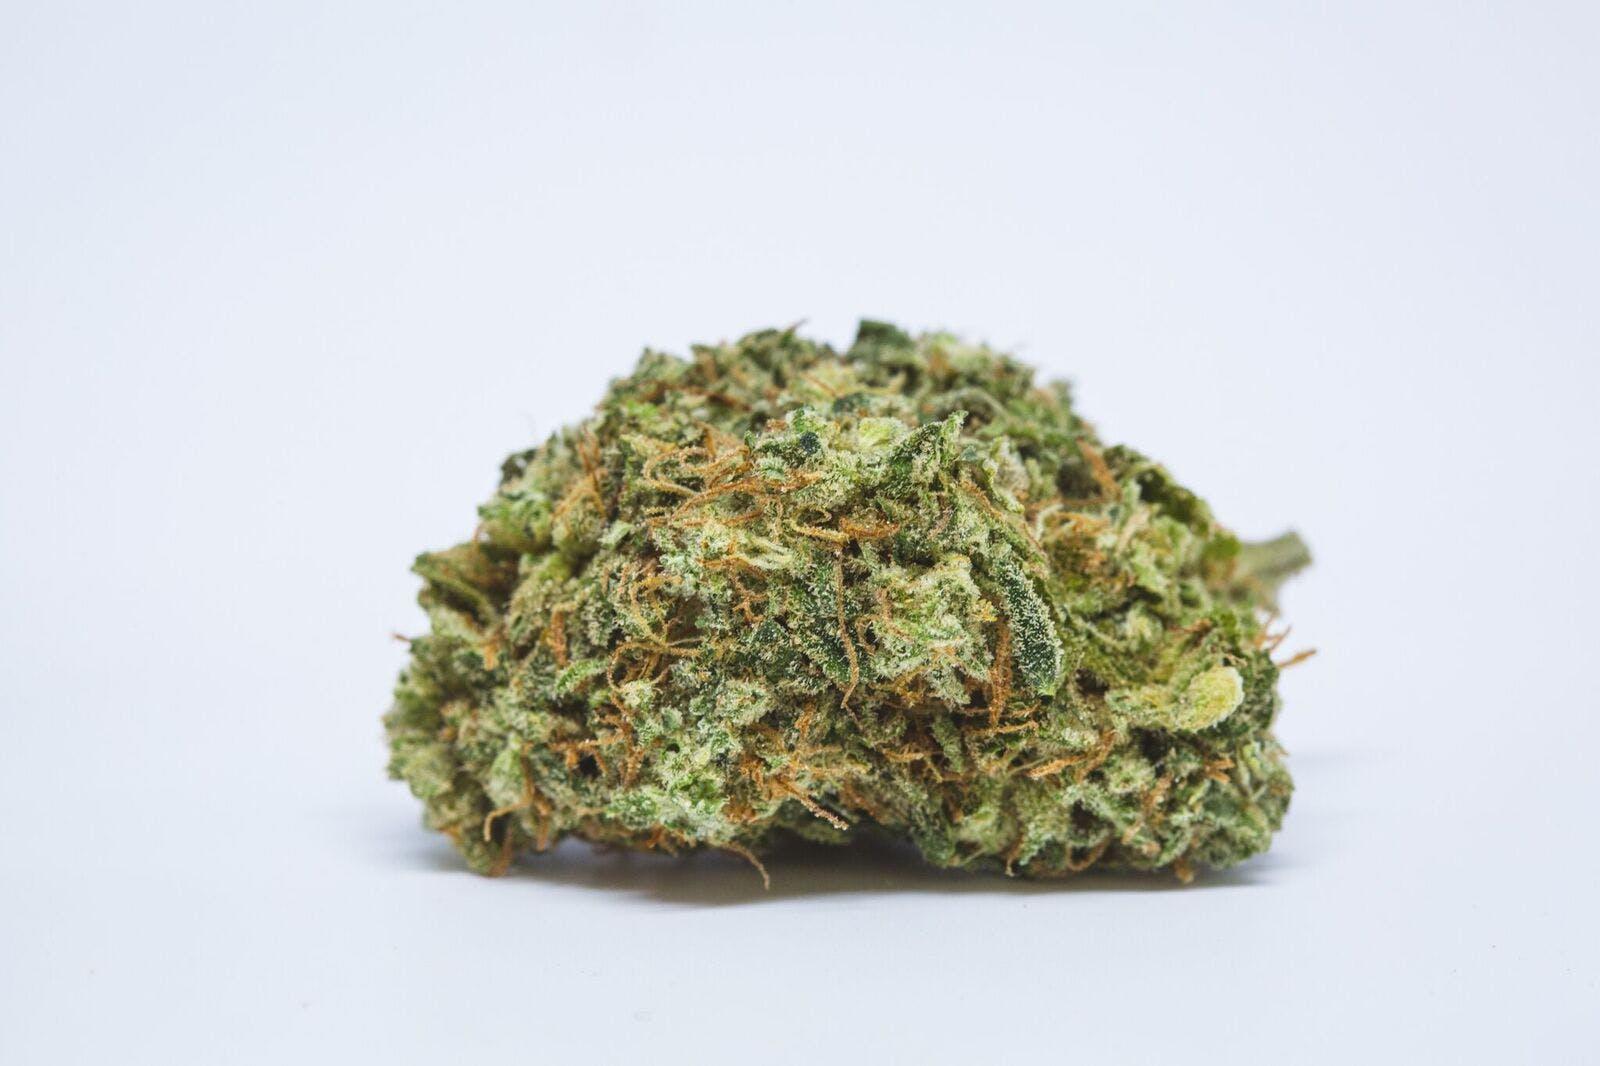 Crystal Coma Weed; Crystal Coma Cannabis Strain; Crystal Coma Sativa Marijuana Strain